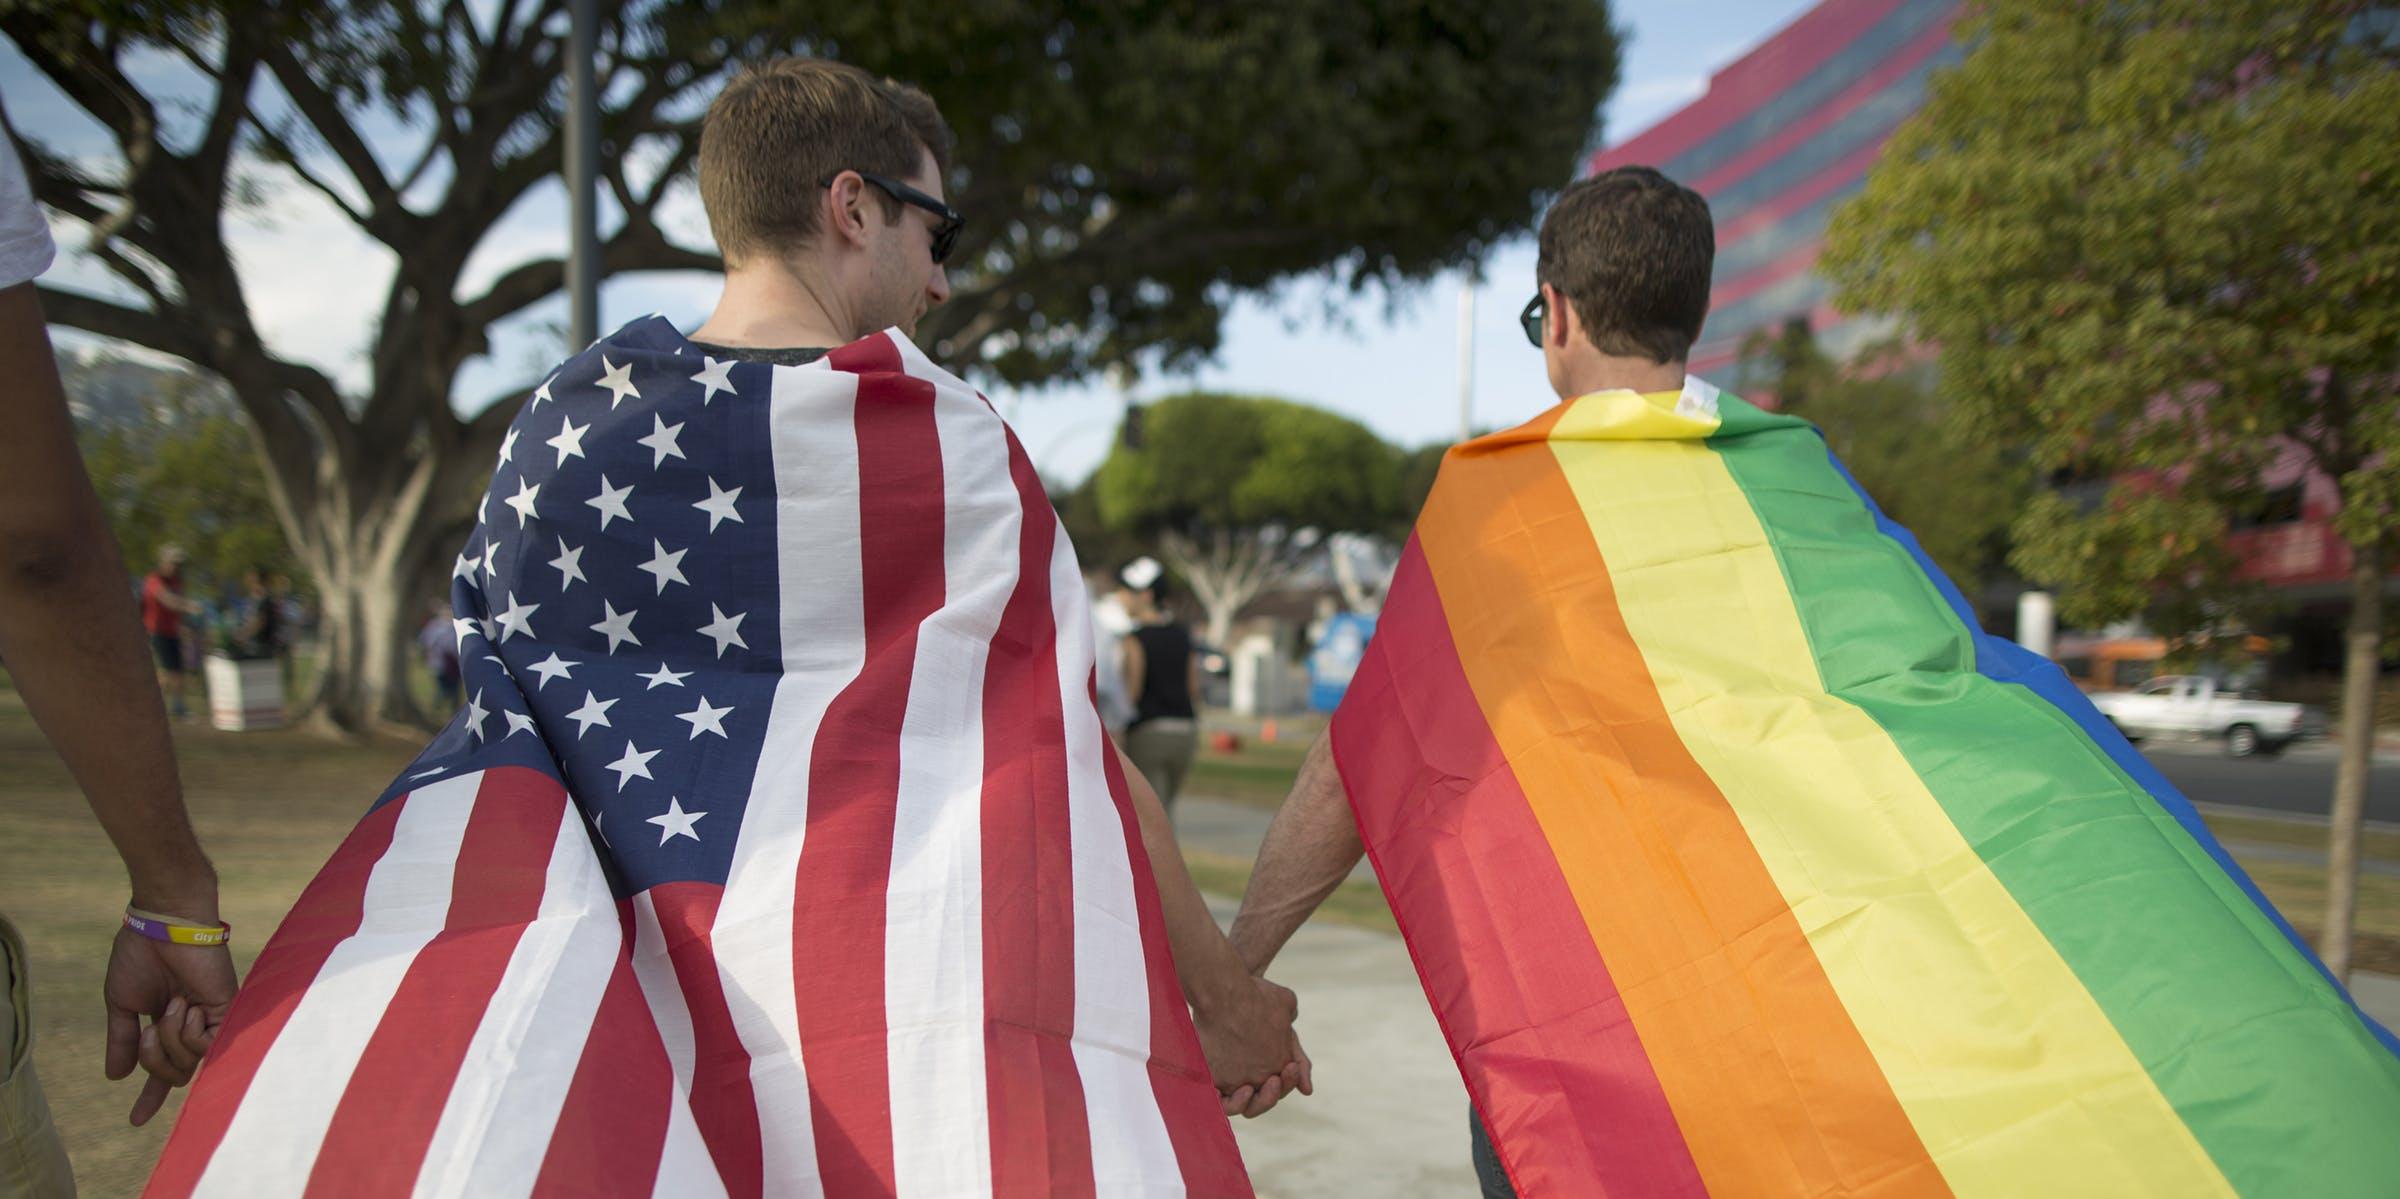 Amerika'nın Gay Popülasyonu En Yüksek Şehirleri